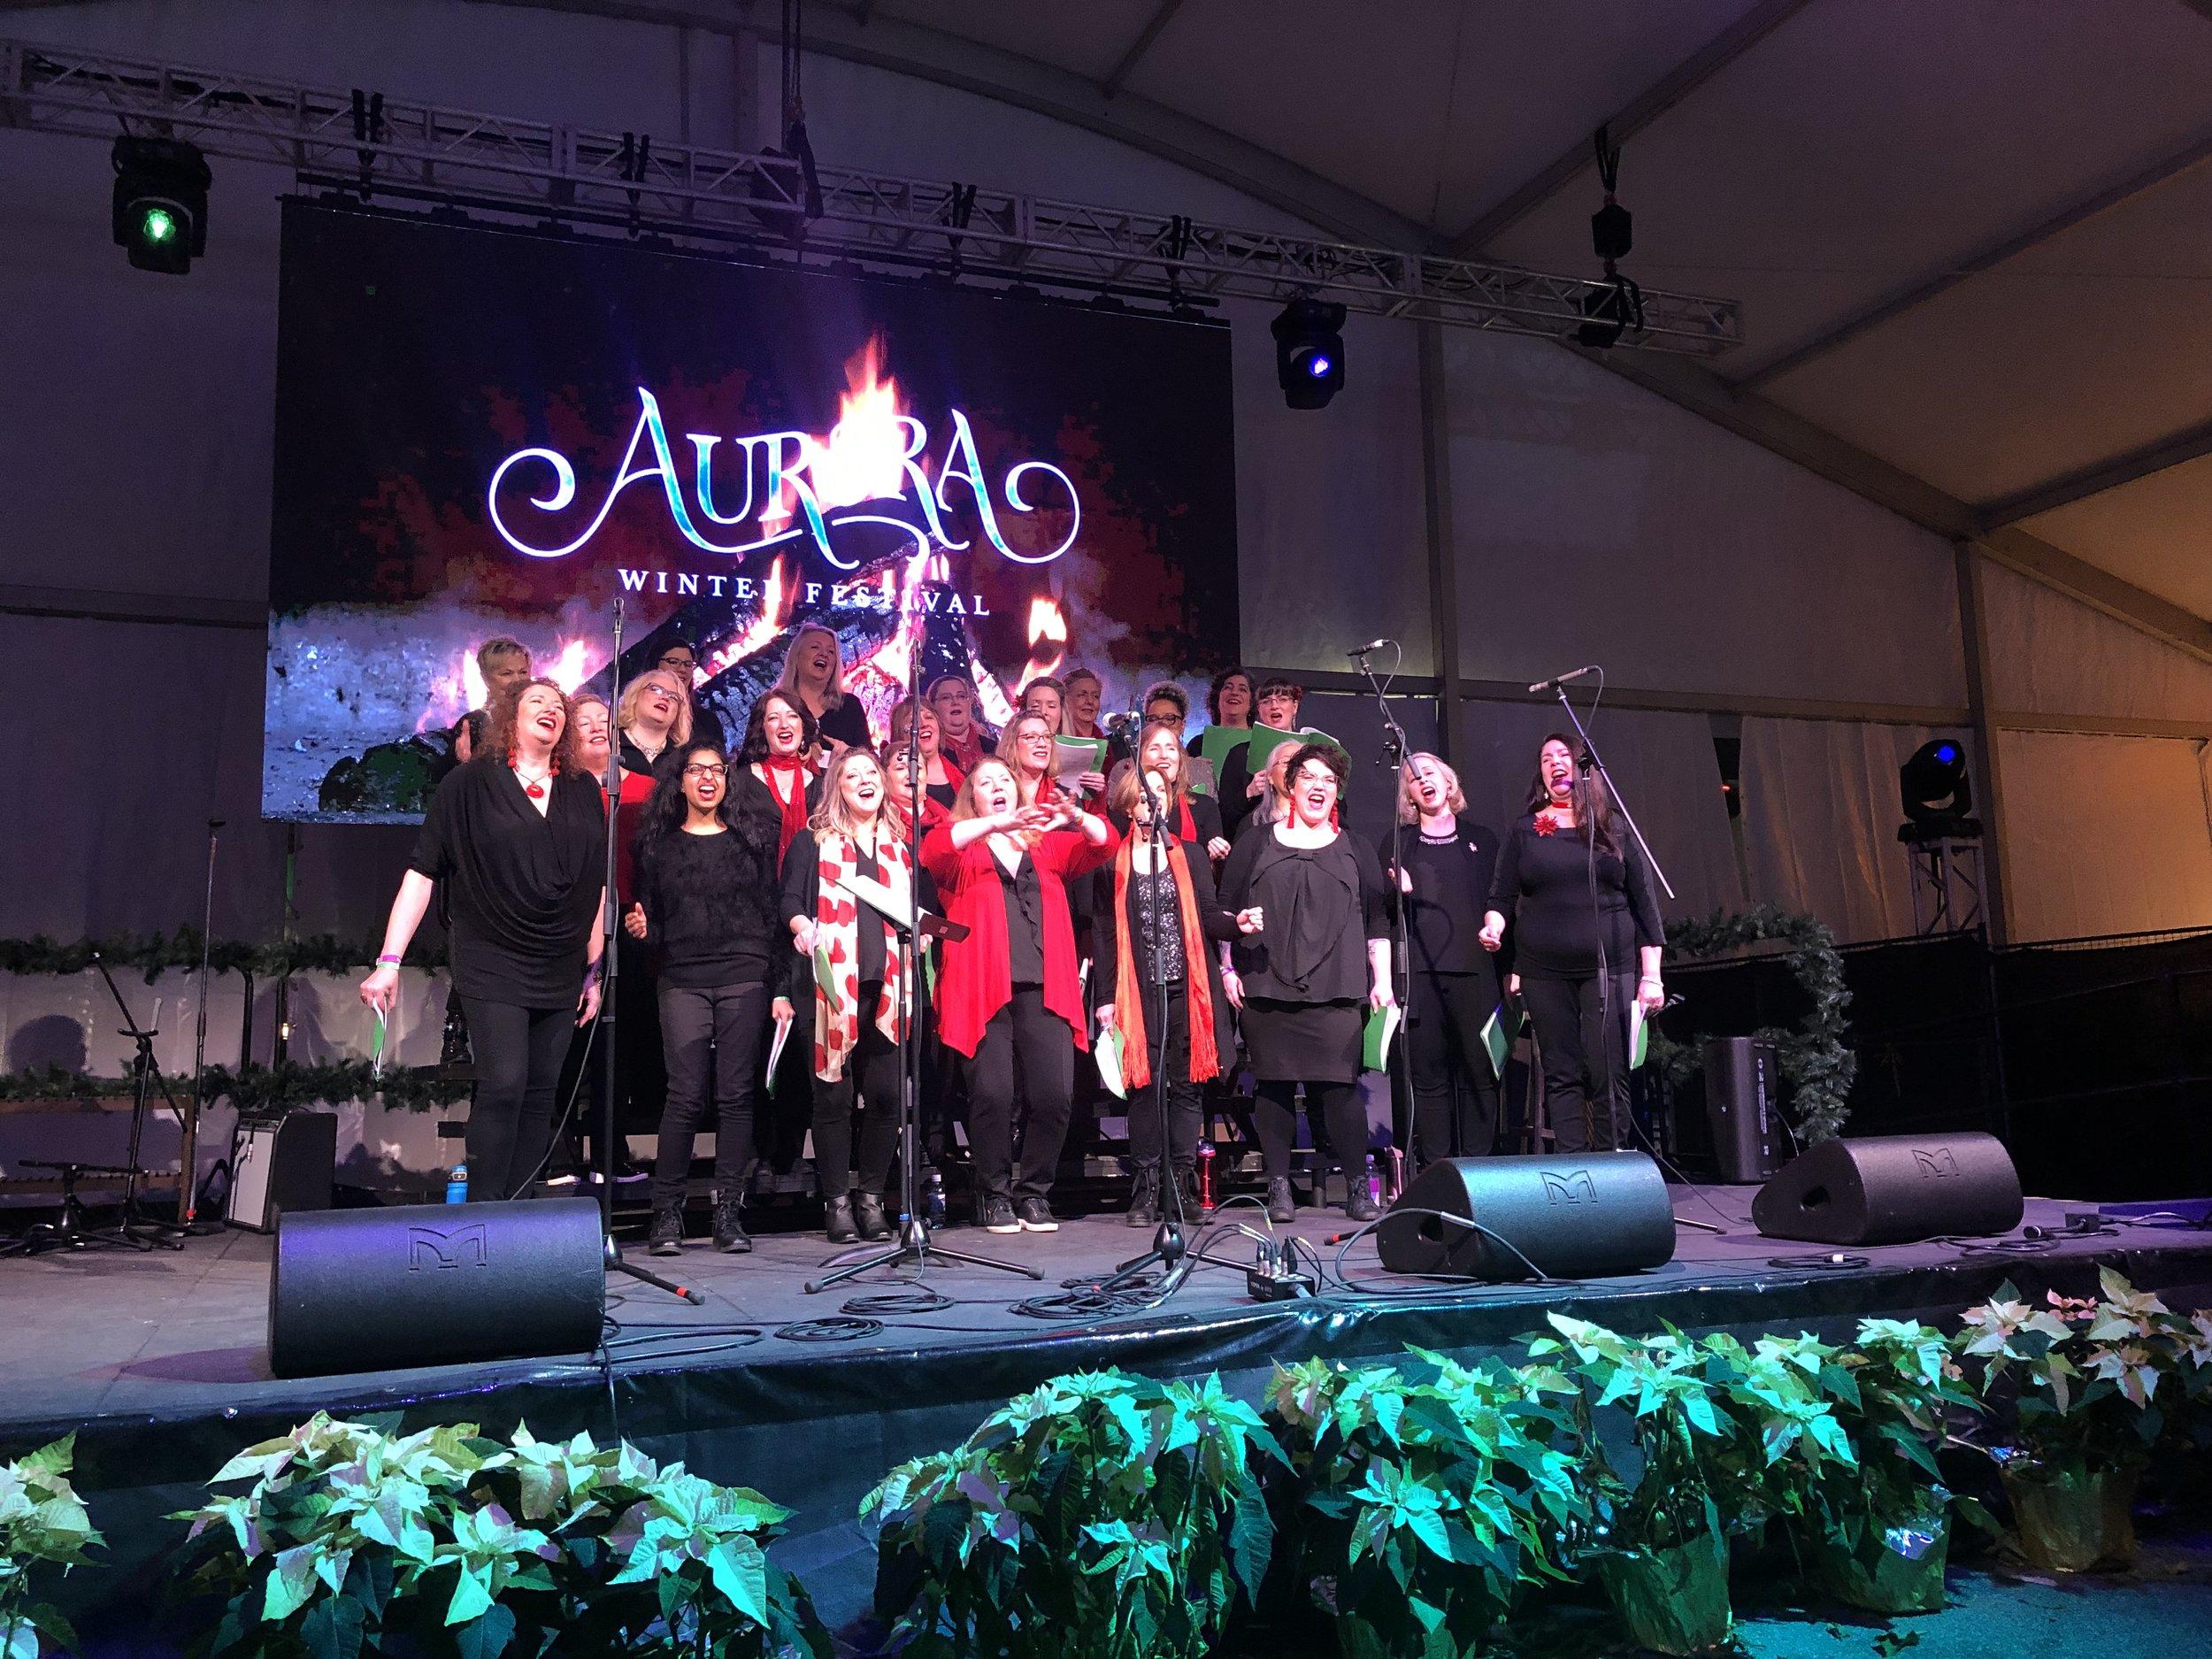 Lions Gate Lite - Aurora Winter Festival 2018